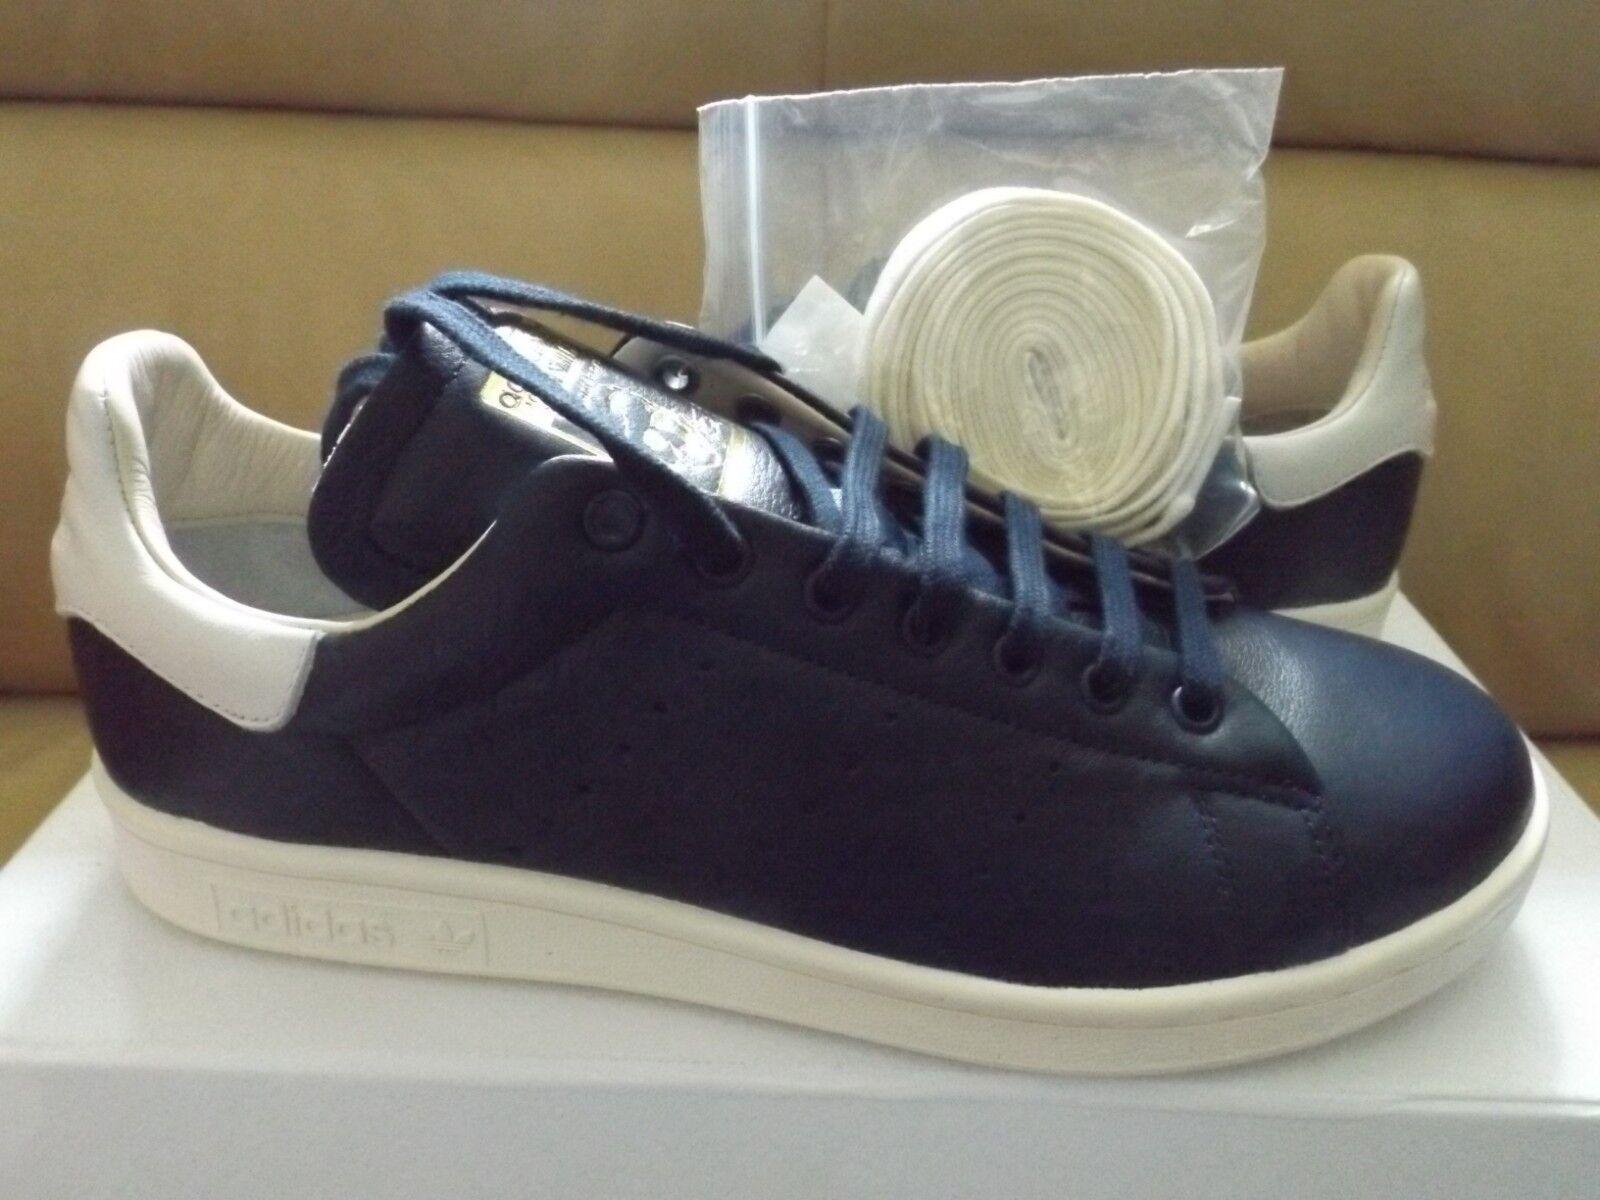 Adidas Men's Originals Stan Smith Recon Men's Adidas Size 7 Shoes College Navy/White CQ3034 b326b4